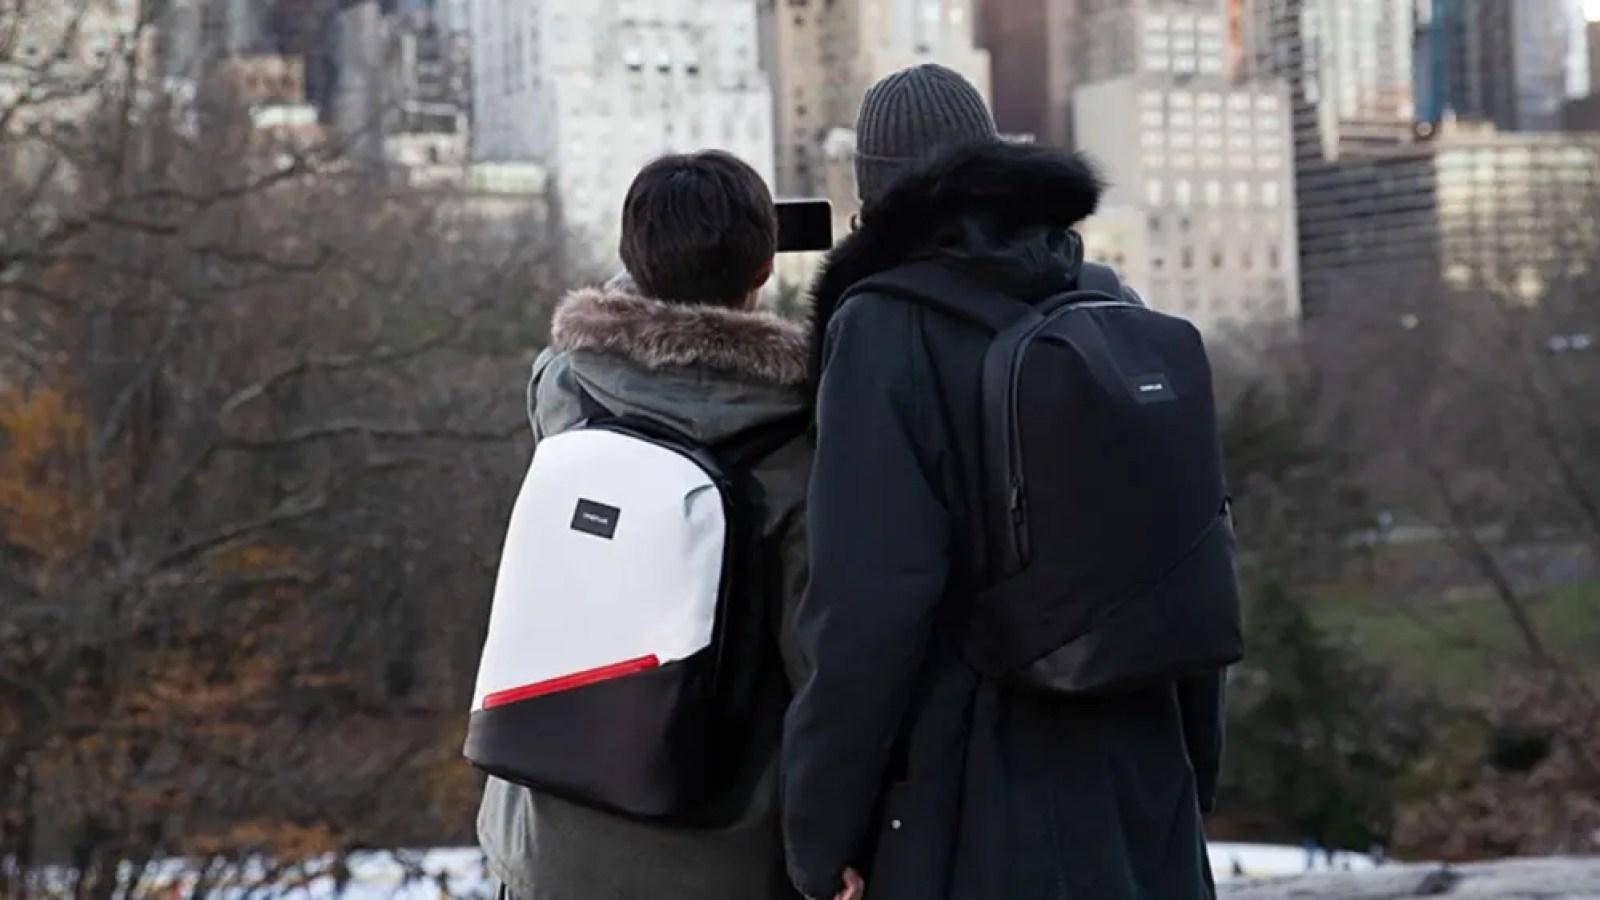 Two people wearing Urban Traveler backpacks.